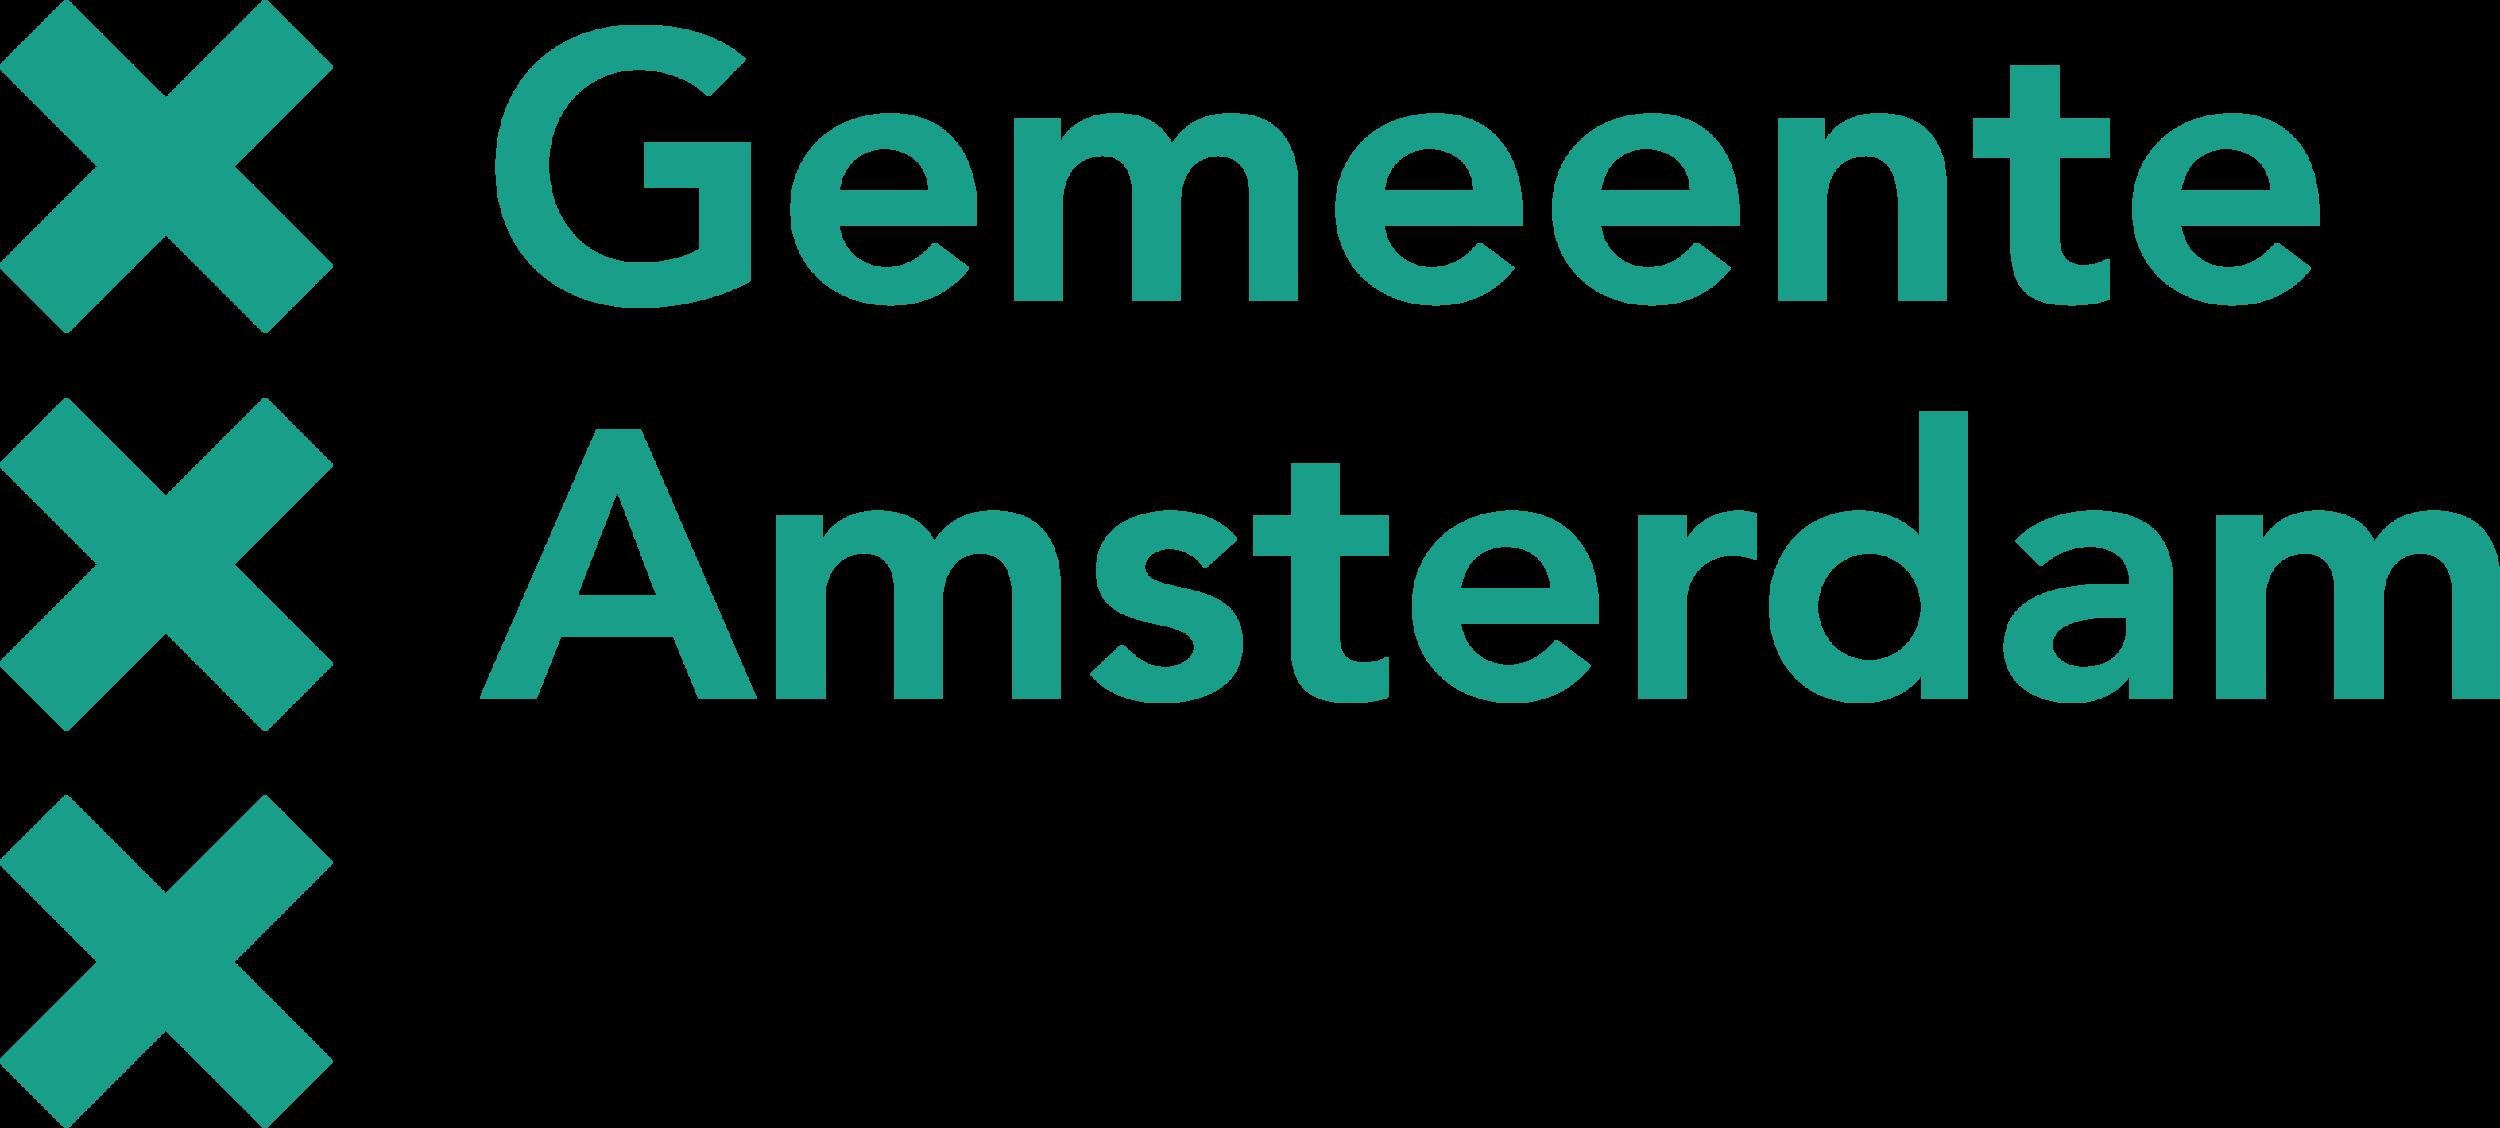 Gemeente Logo AMS ug web.png